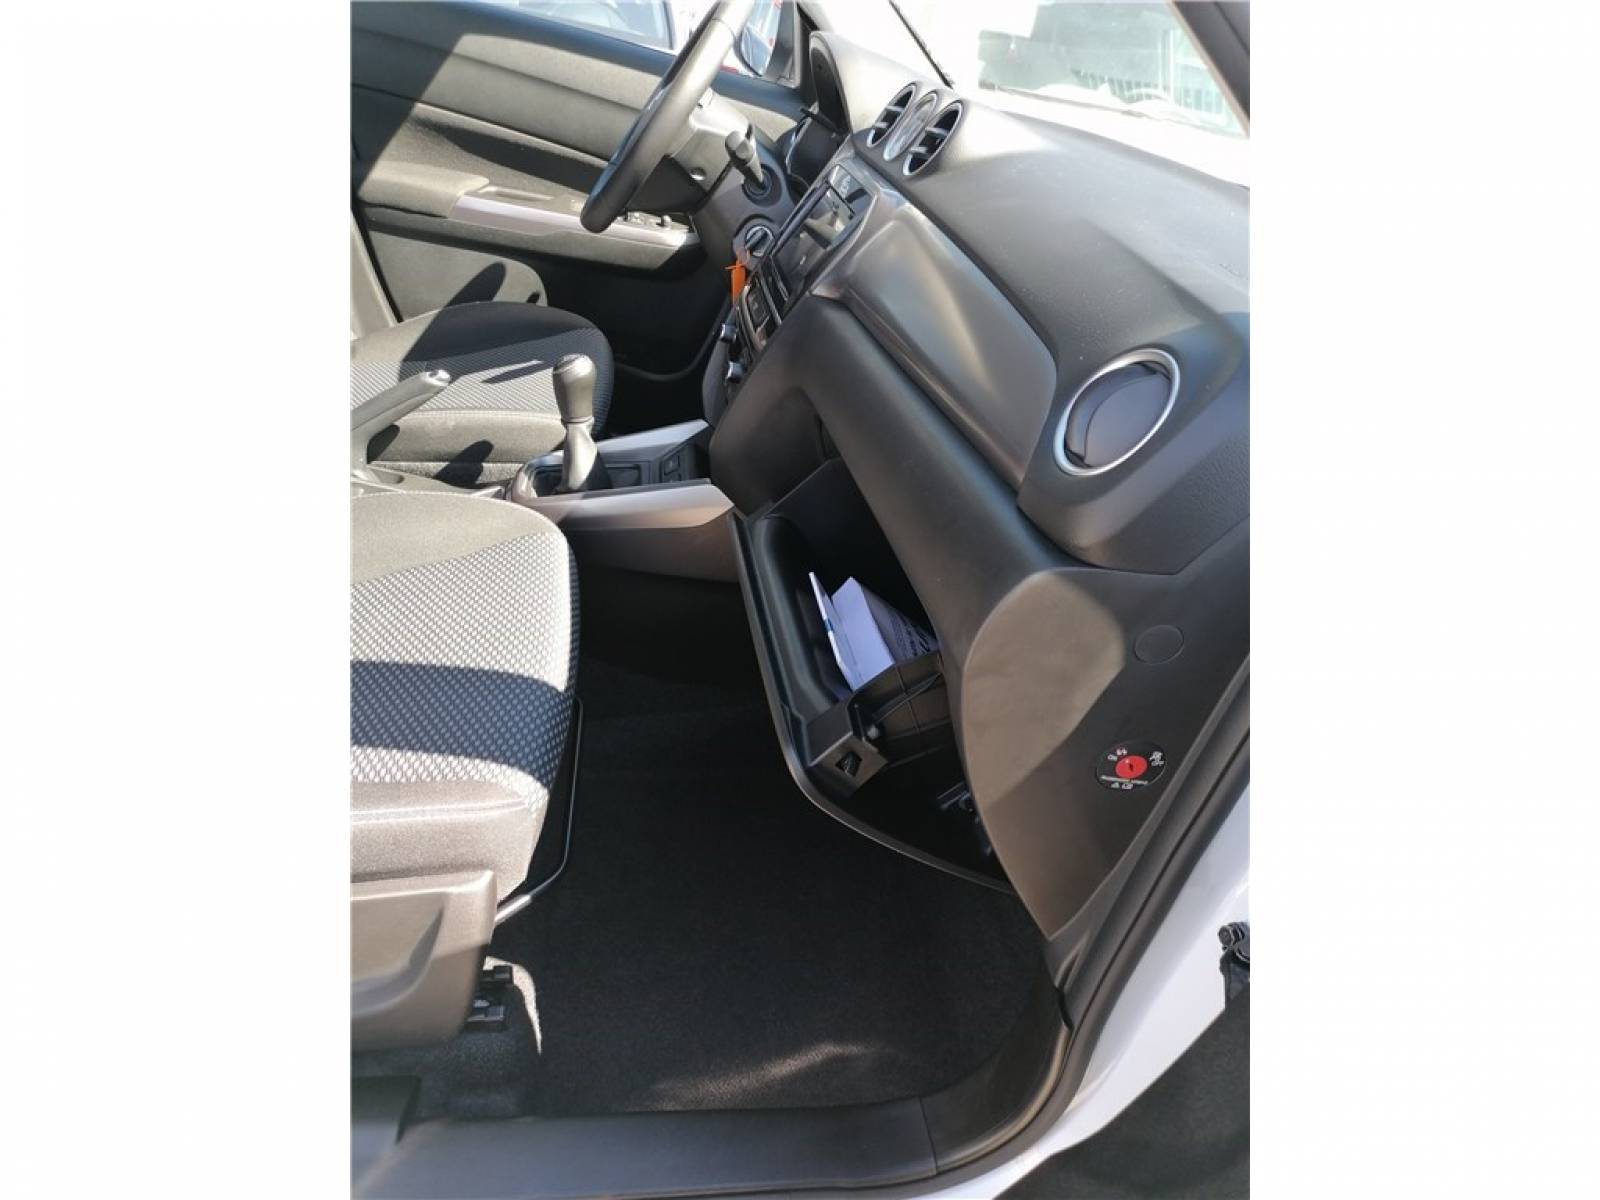 SUZUKI Vitara 1.0 Boosterjet - véhicule d'occasion - Groupe Guillet - Opel Magicauto - Chalon-sur-Saône - 71380 - Saint-Marcel - 42